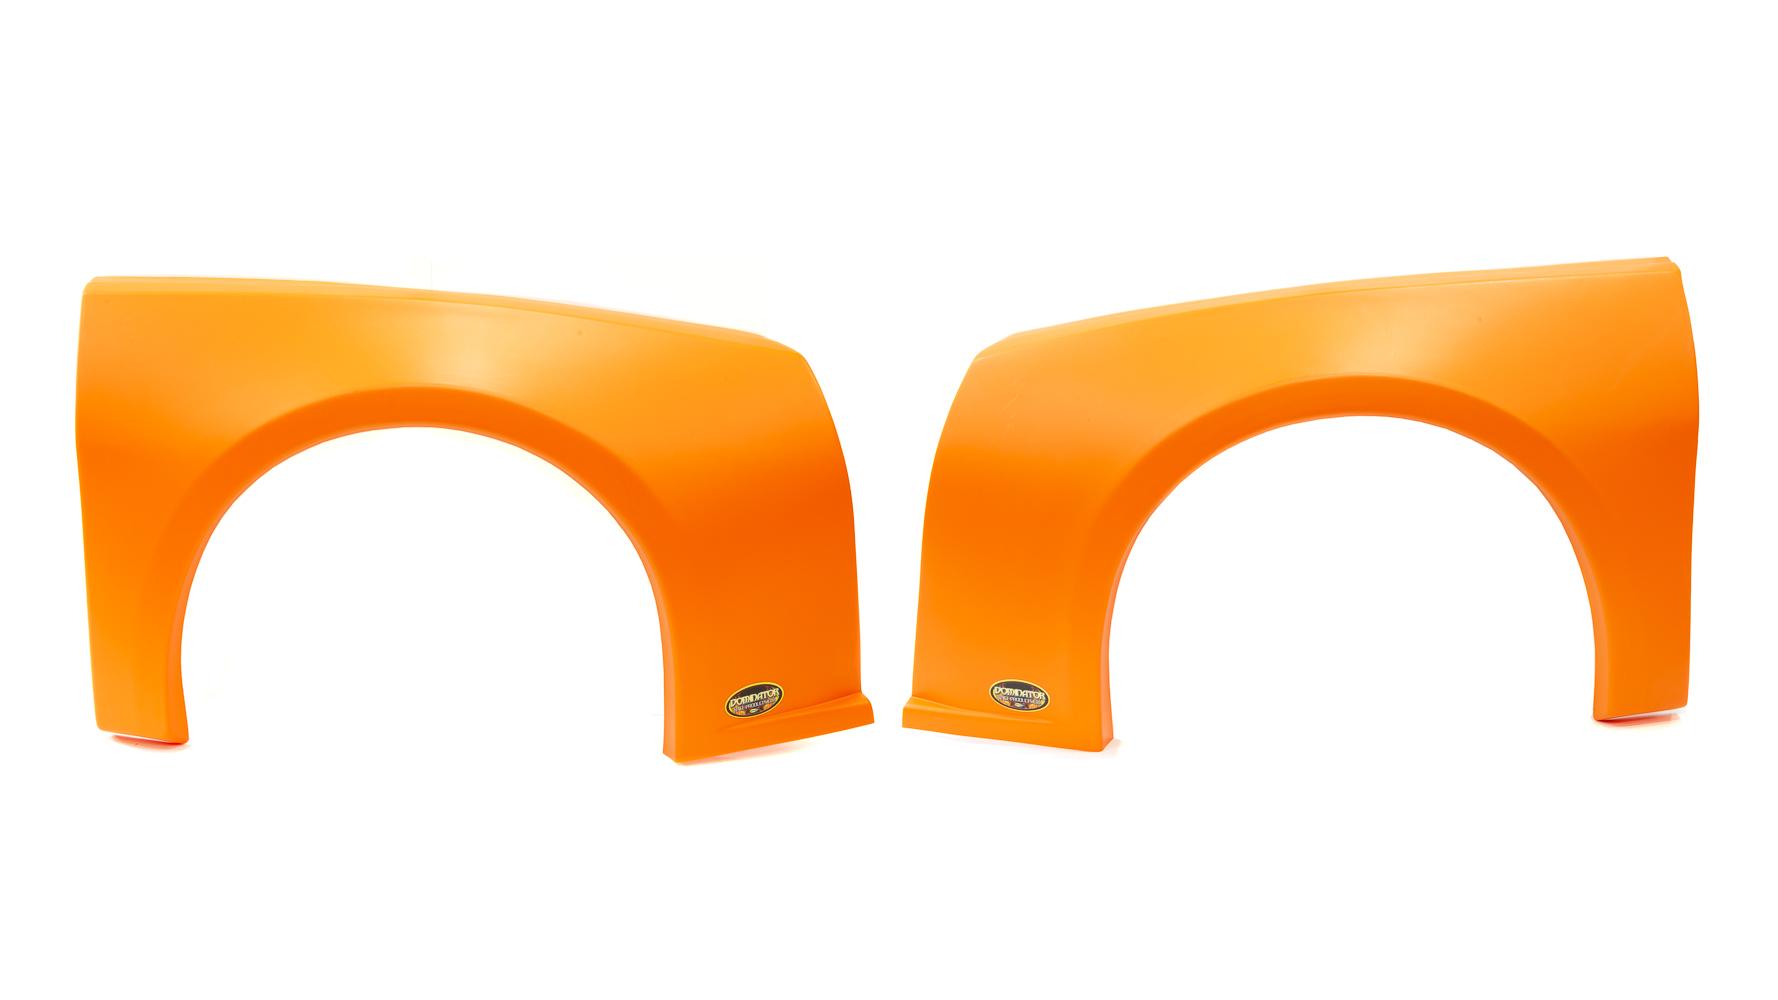 Dominator Racing Products Fender Kit Camaro SS Orange